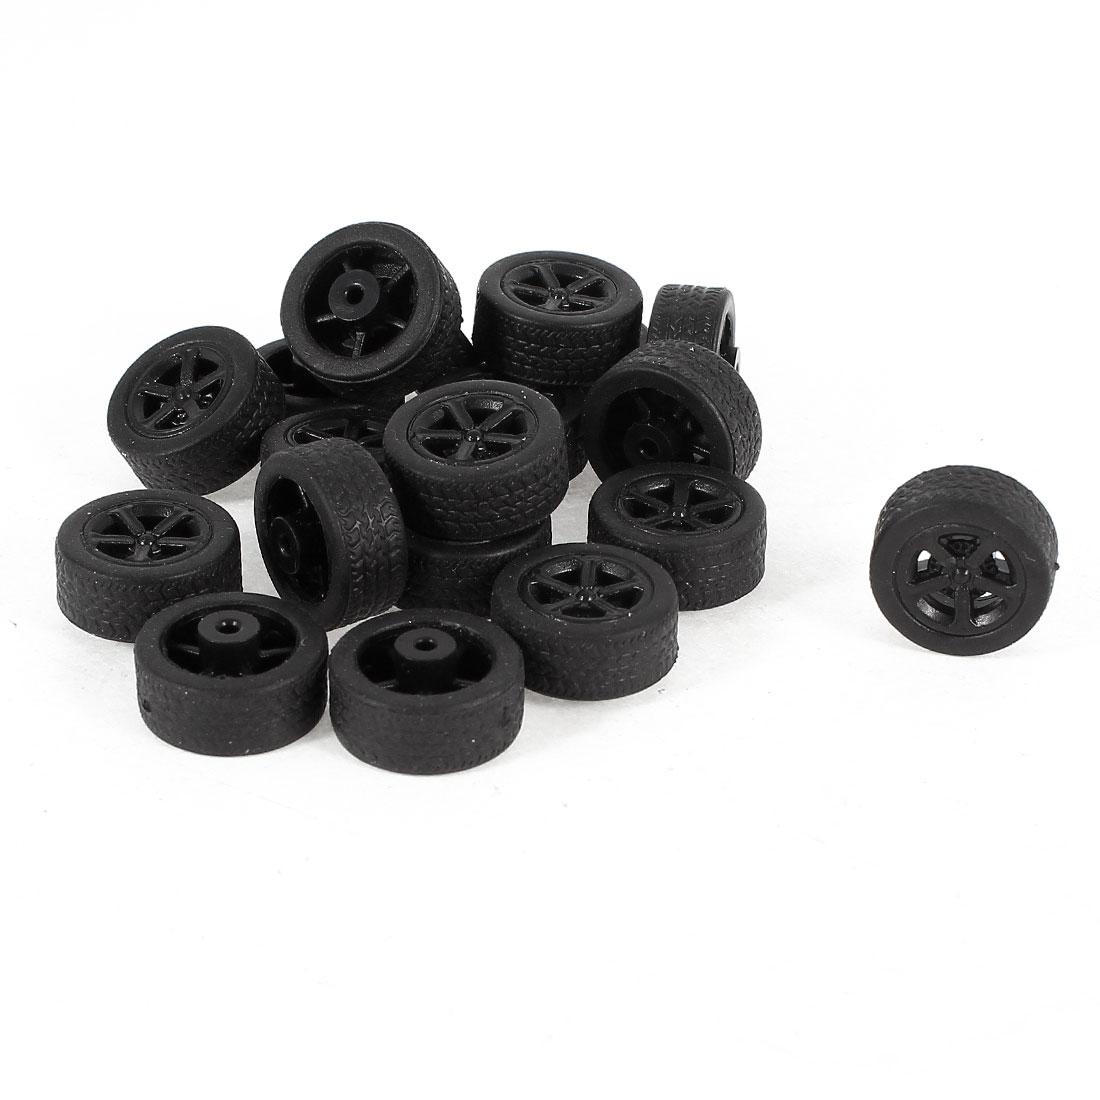 20 Pcs 16mm Dia Rubber Roll Plastic Spoke Car Auto Model Toys Wheels Black